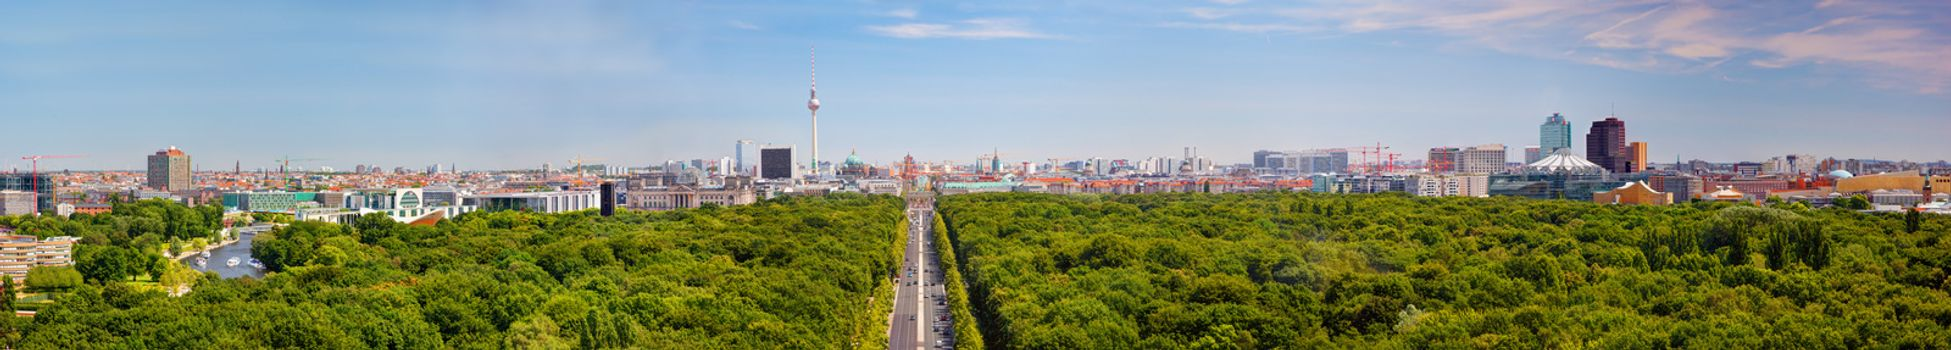 Berlin panorama. Berlin TV Tower and major landmarks